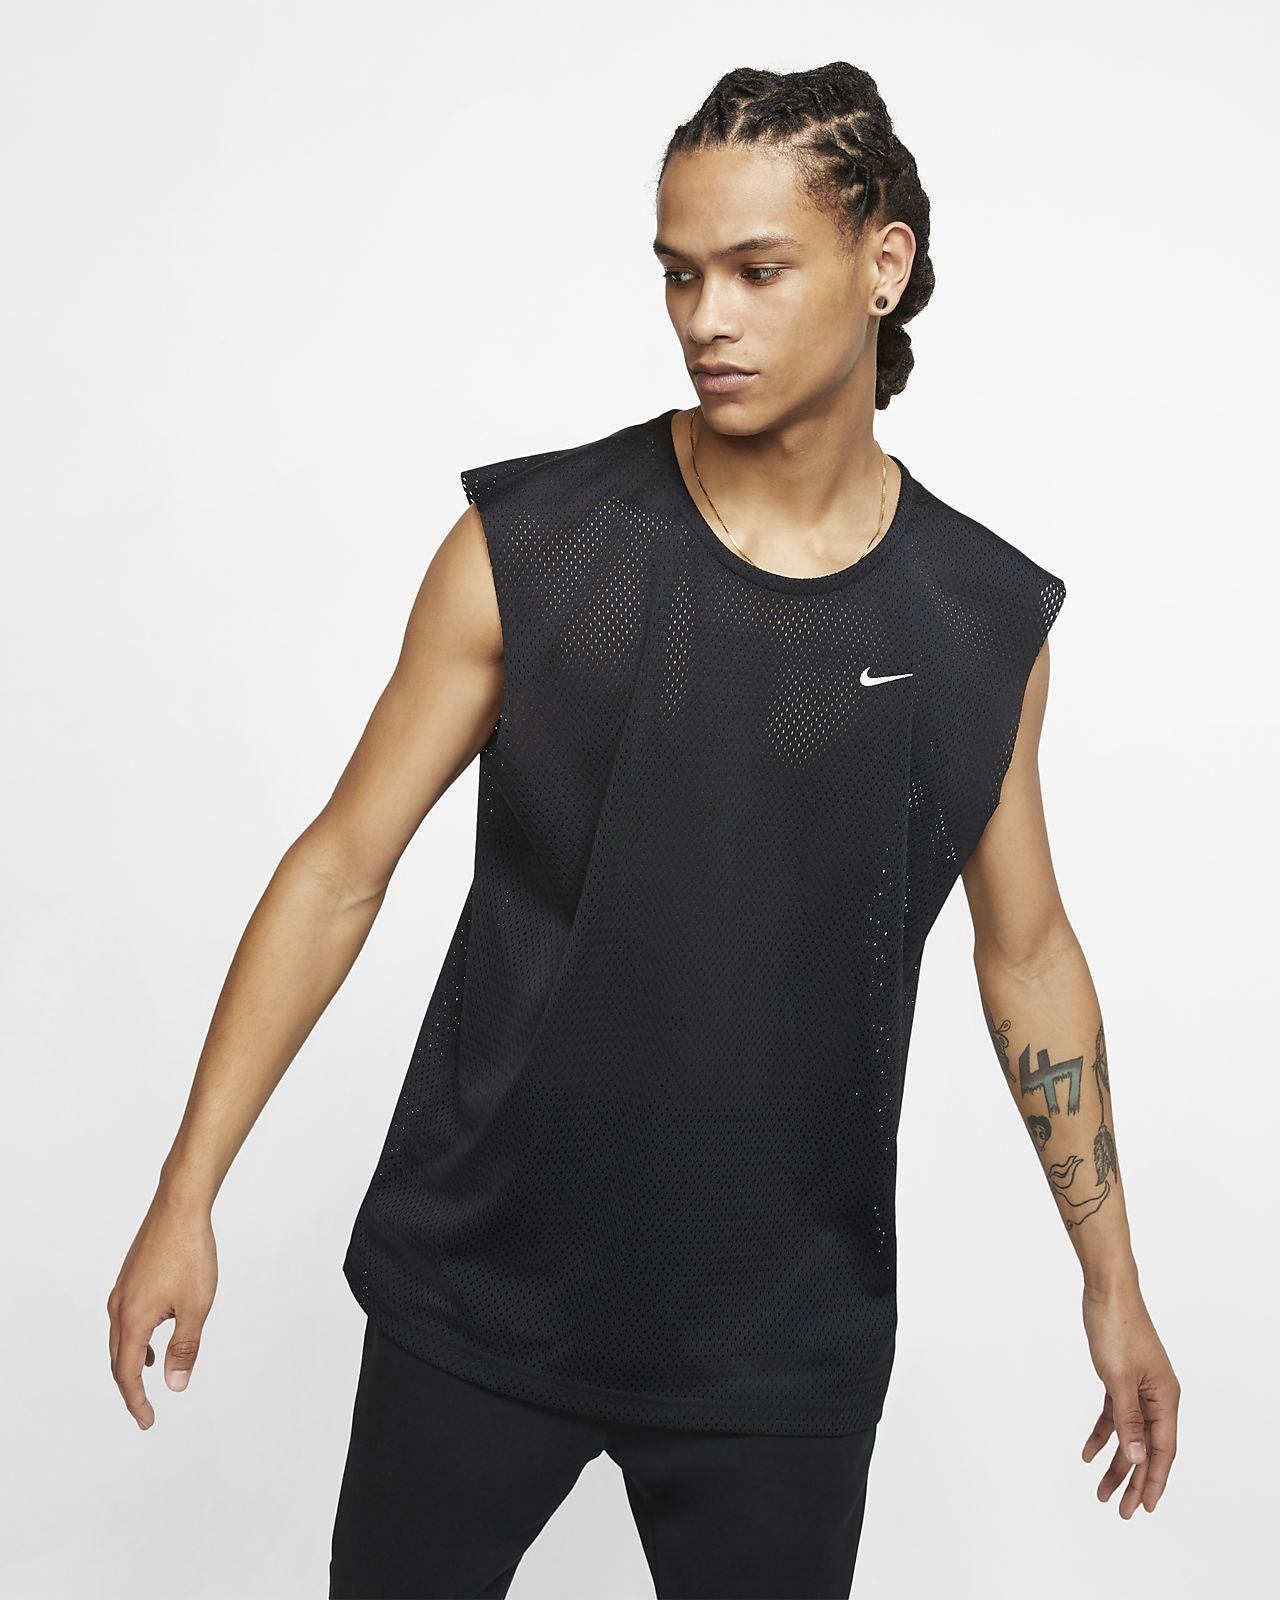 Camisola sem mangas NikeLab Collection para homem